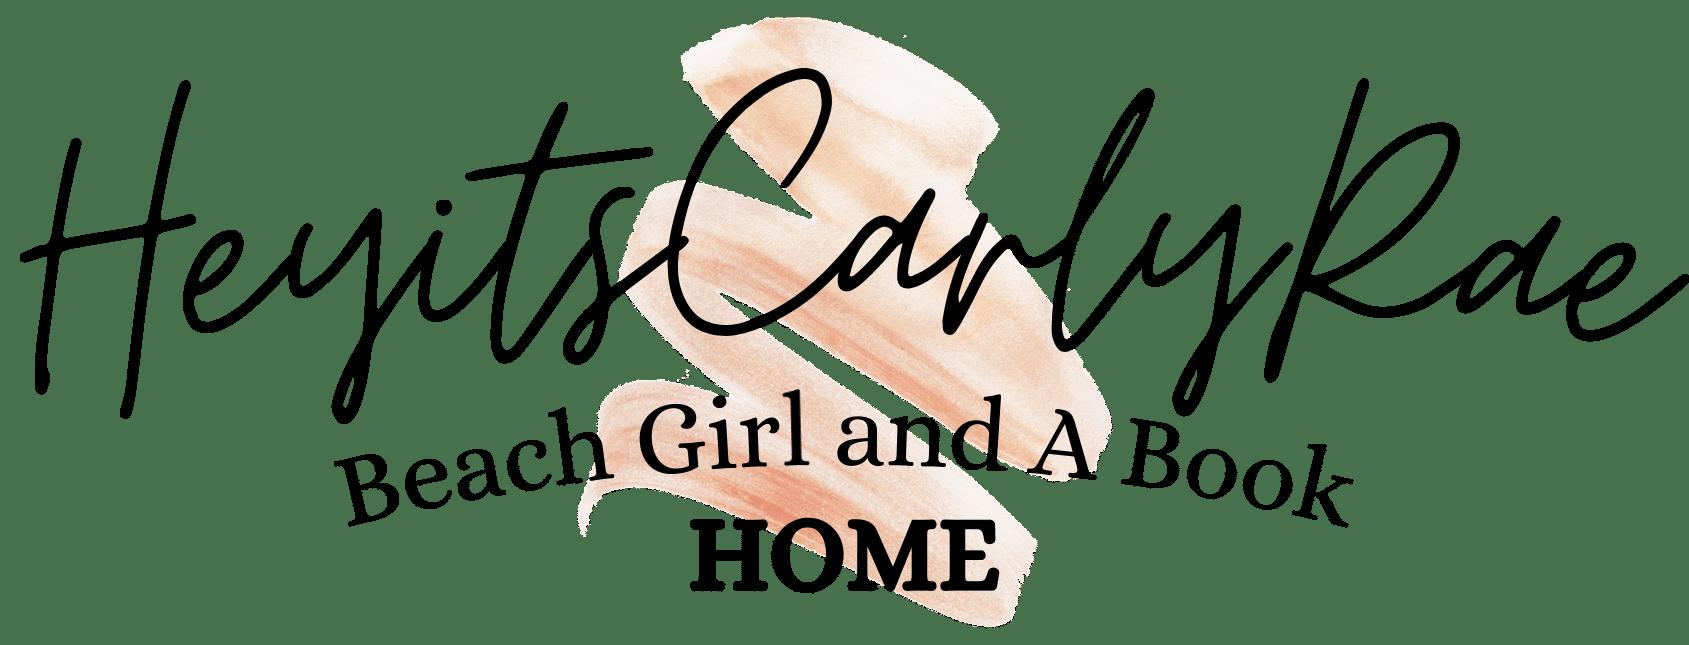 HCR Home Logo